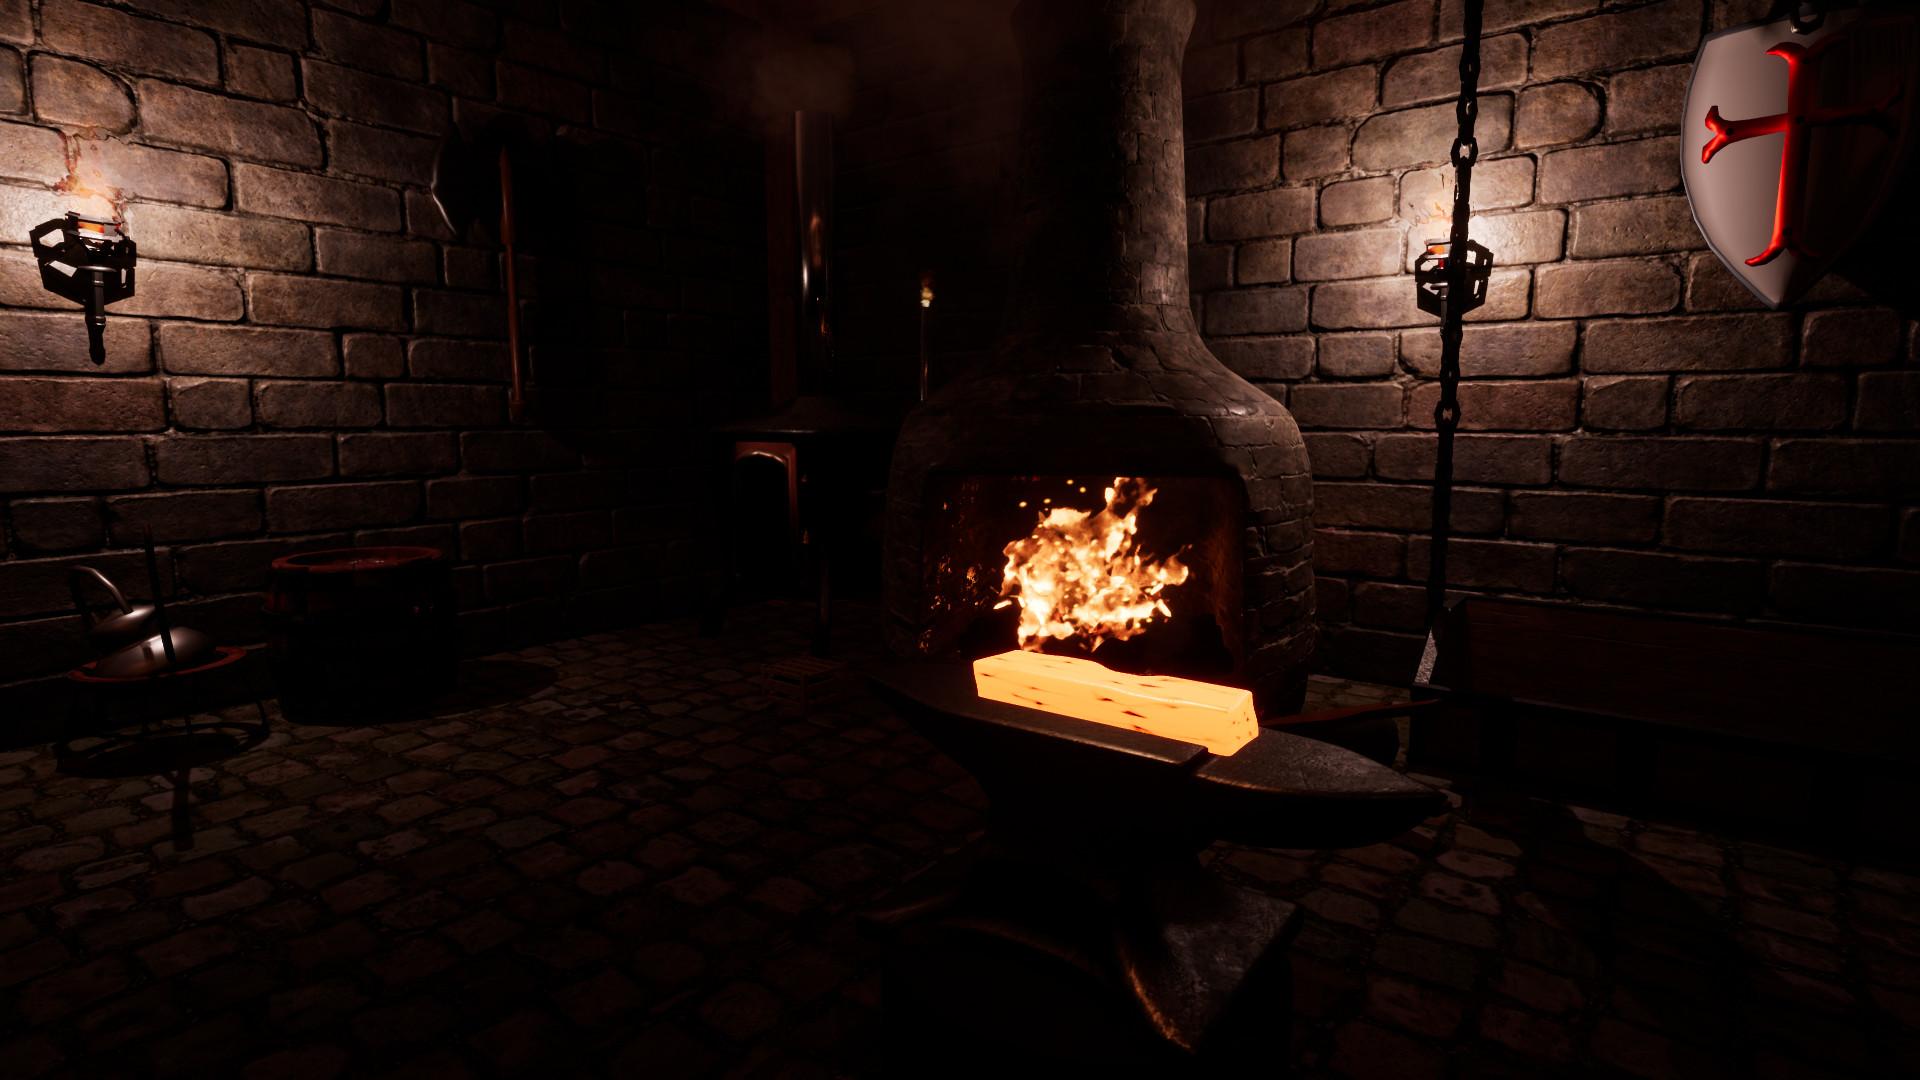 Find the best laptops for Fantasy Blacksmith